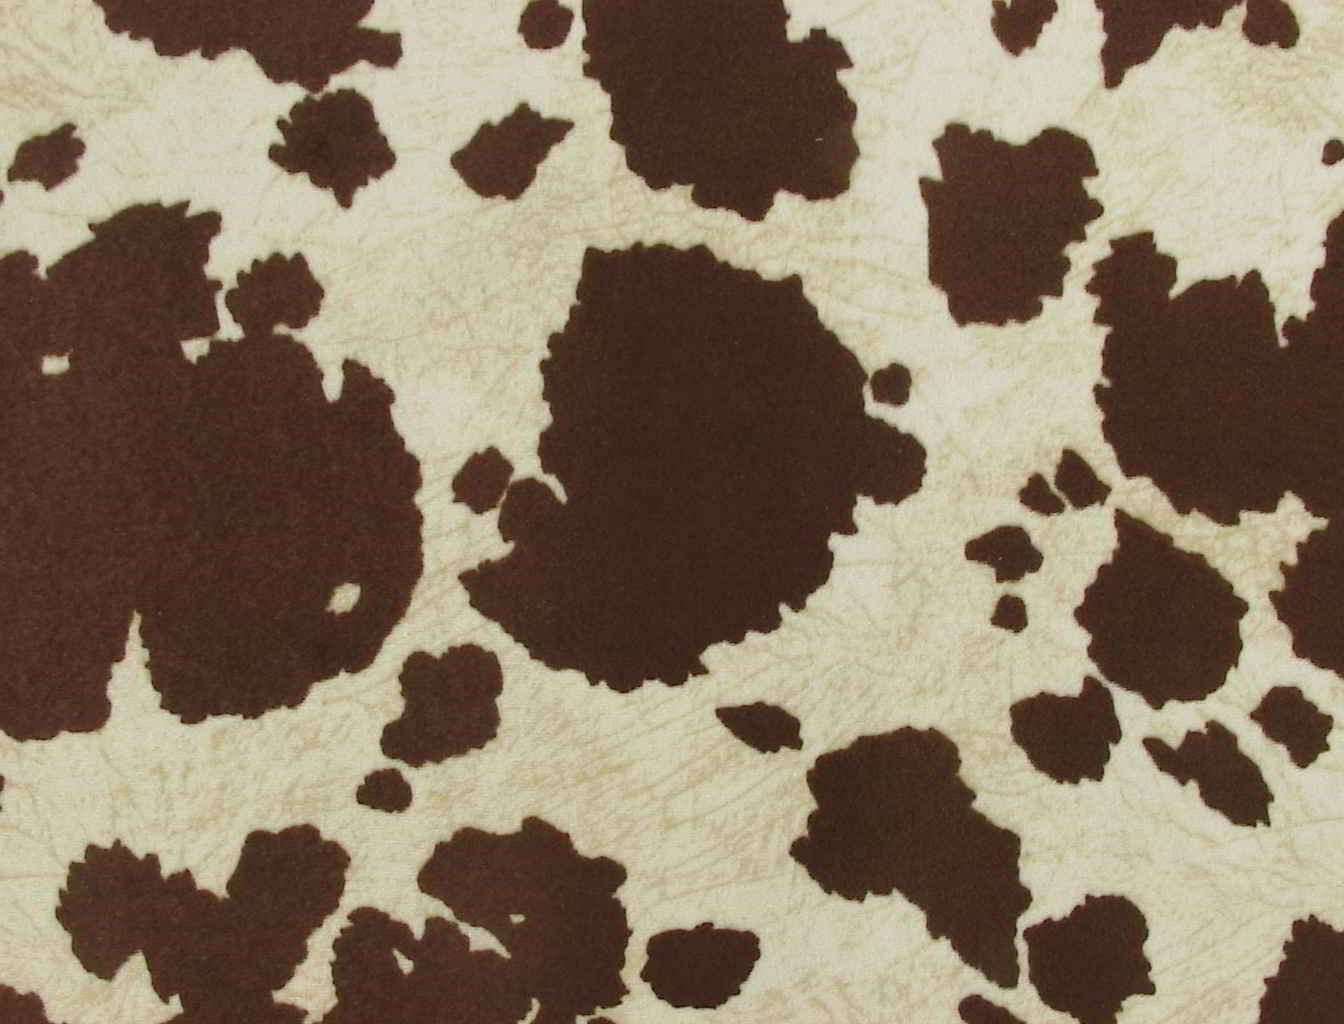 cow print office chair brown